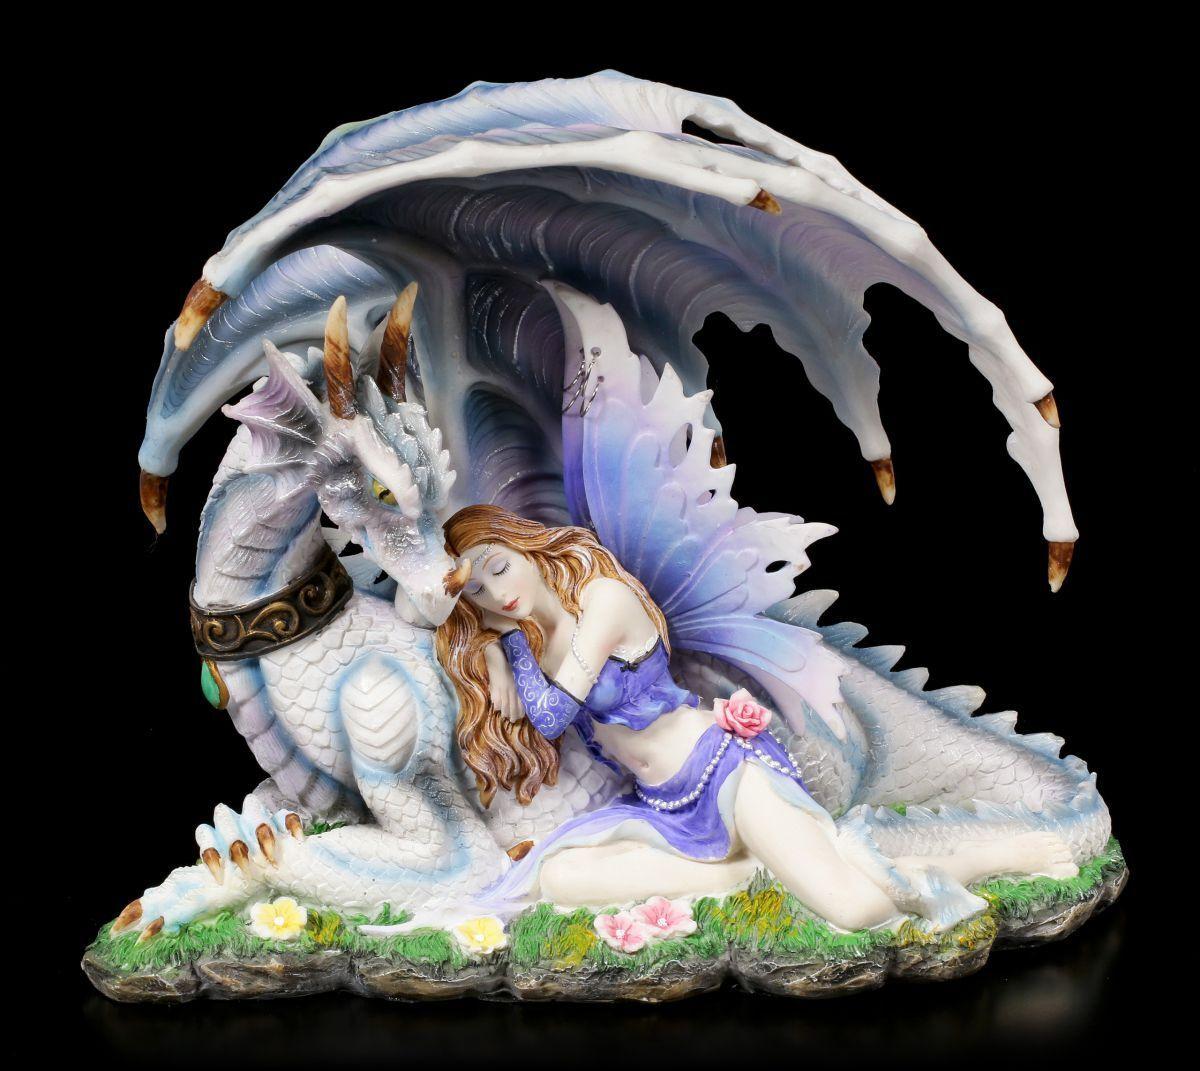 Figura Elfos - myrha CON DRAGÓN - Fantasía drachenelfe feenfigur Decoración